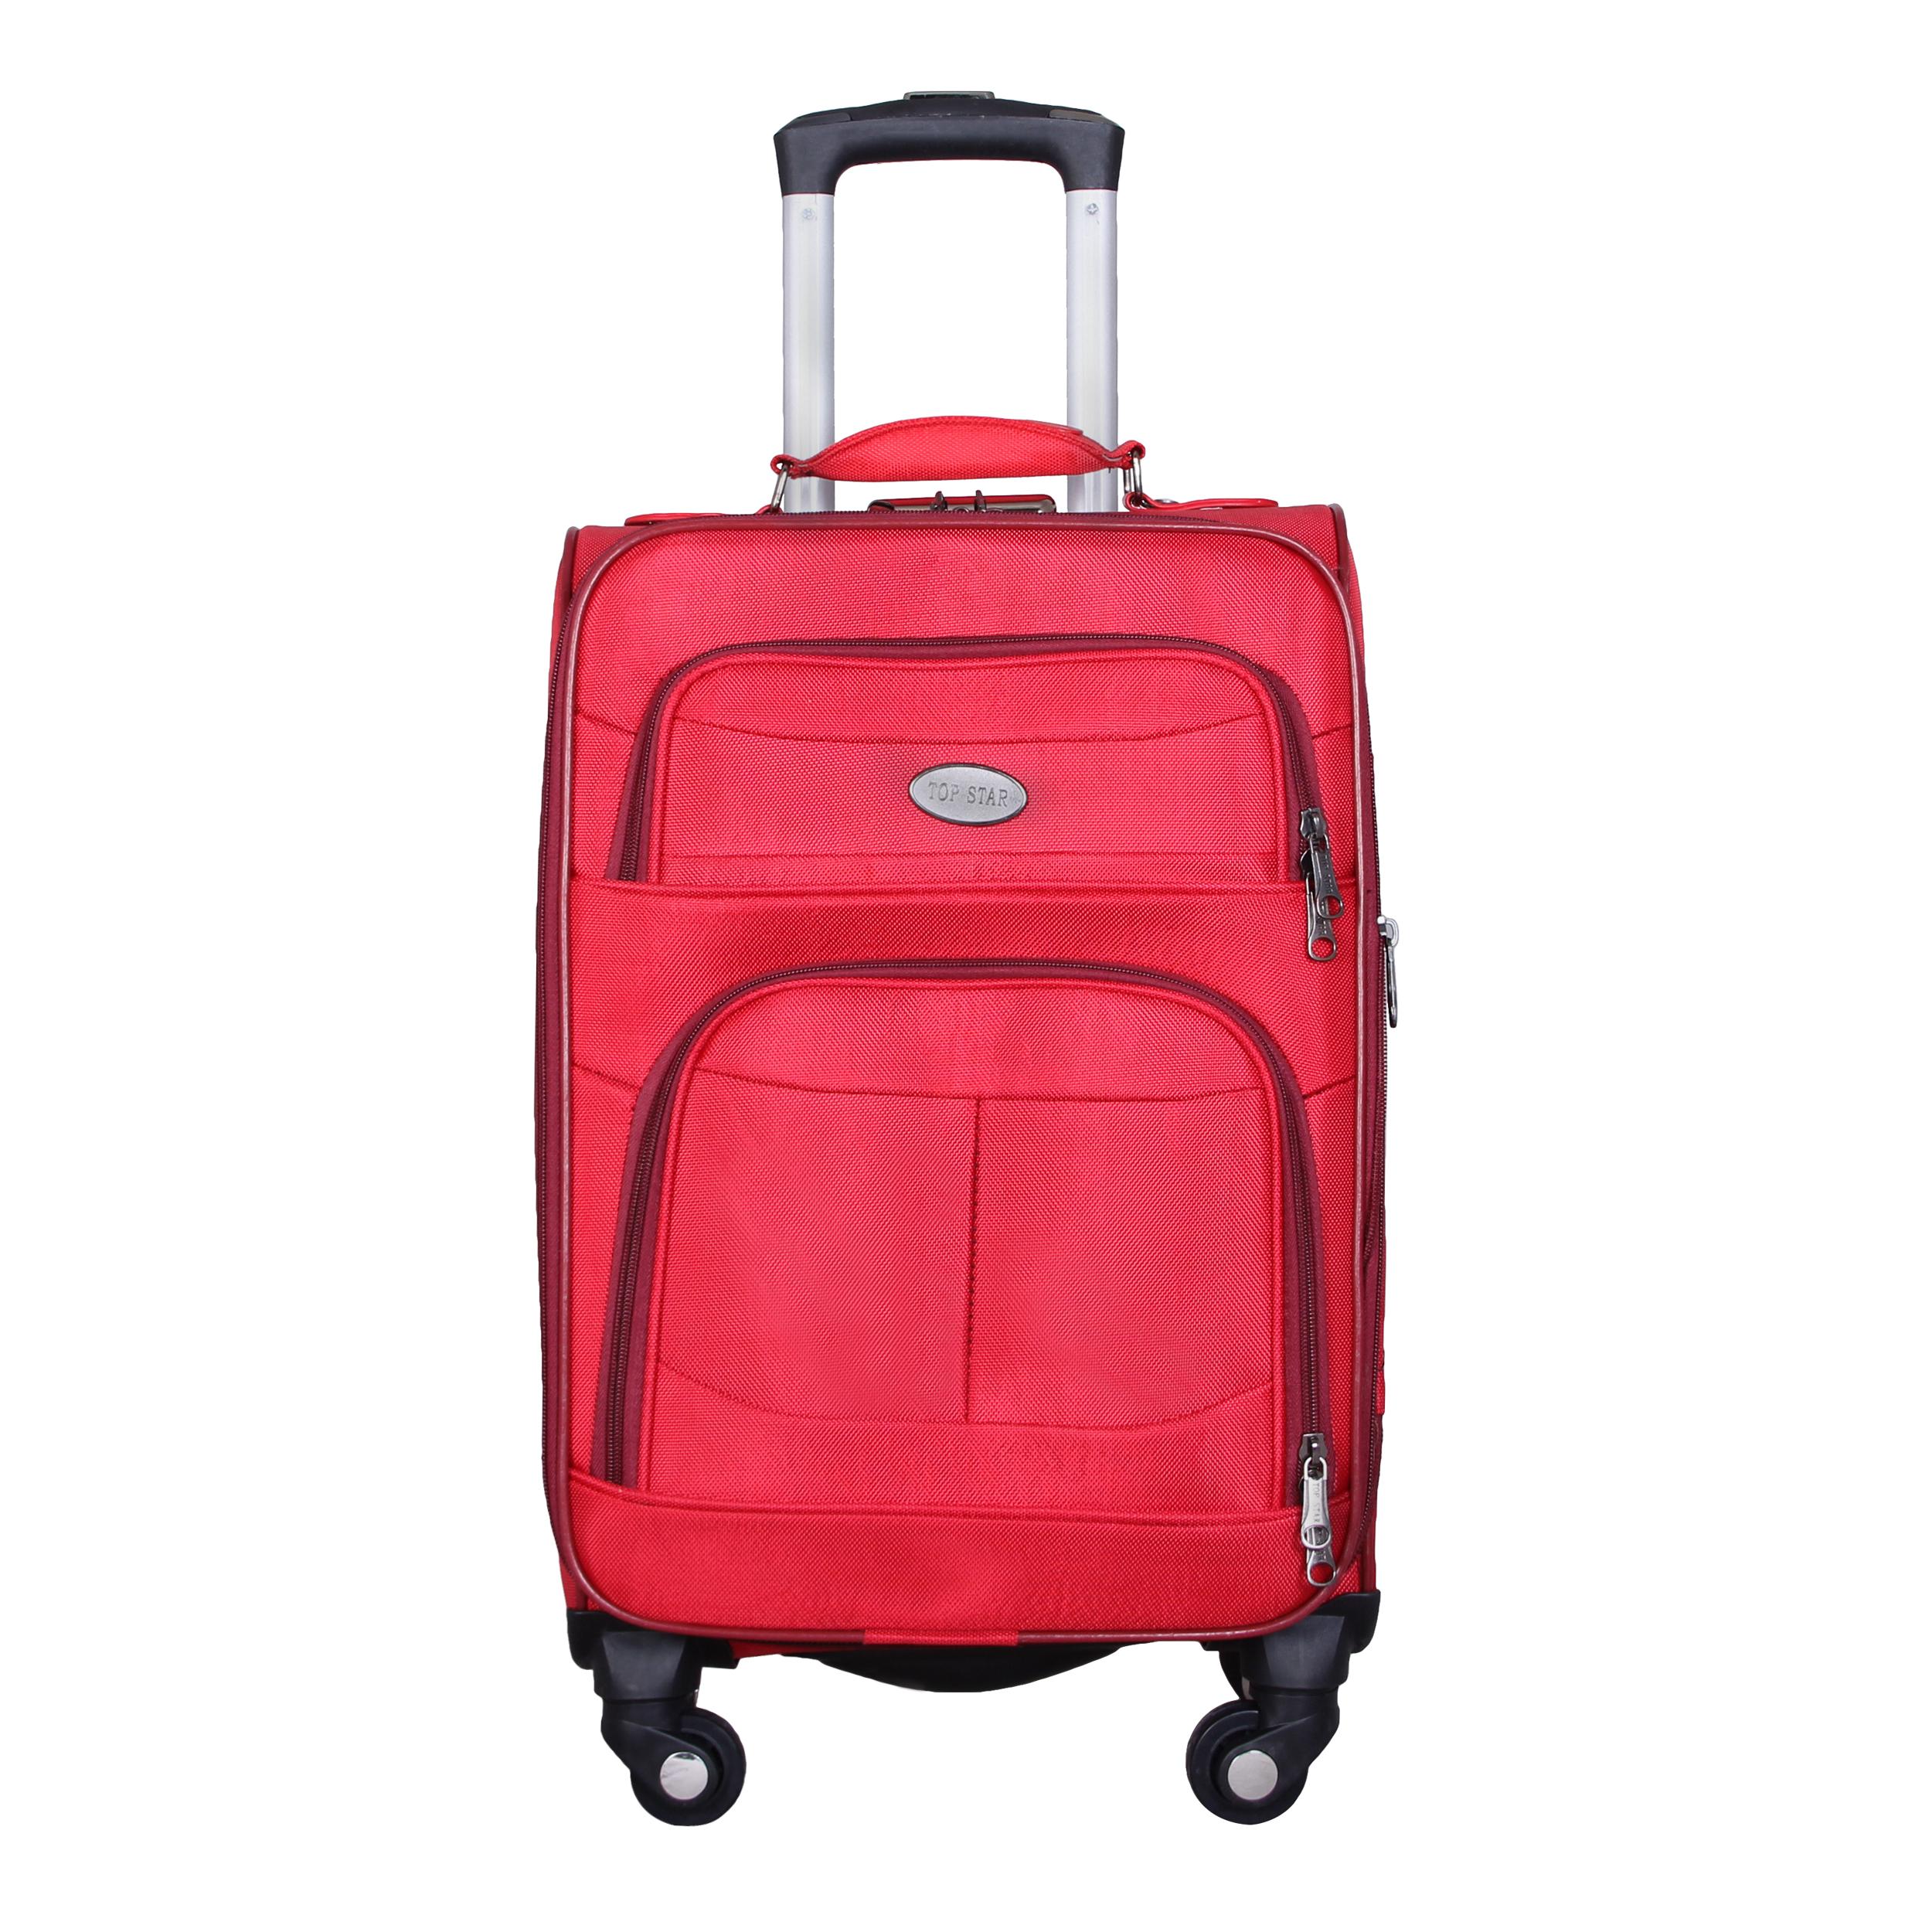 مجموعه سه عددی چمدان کدA1034 main 1 7